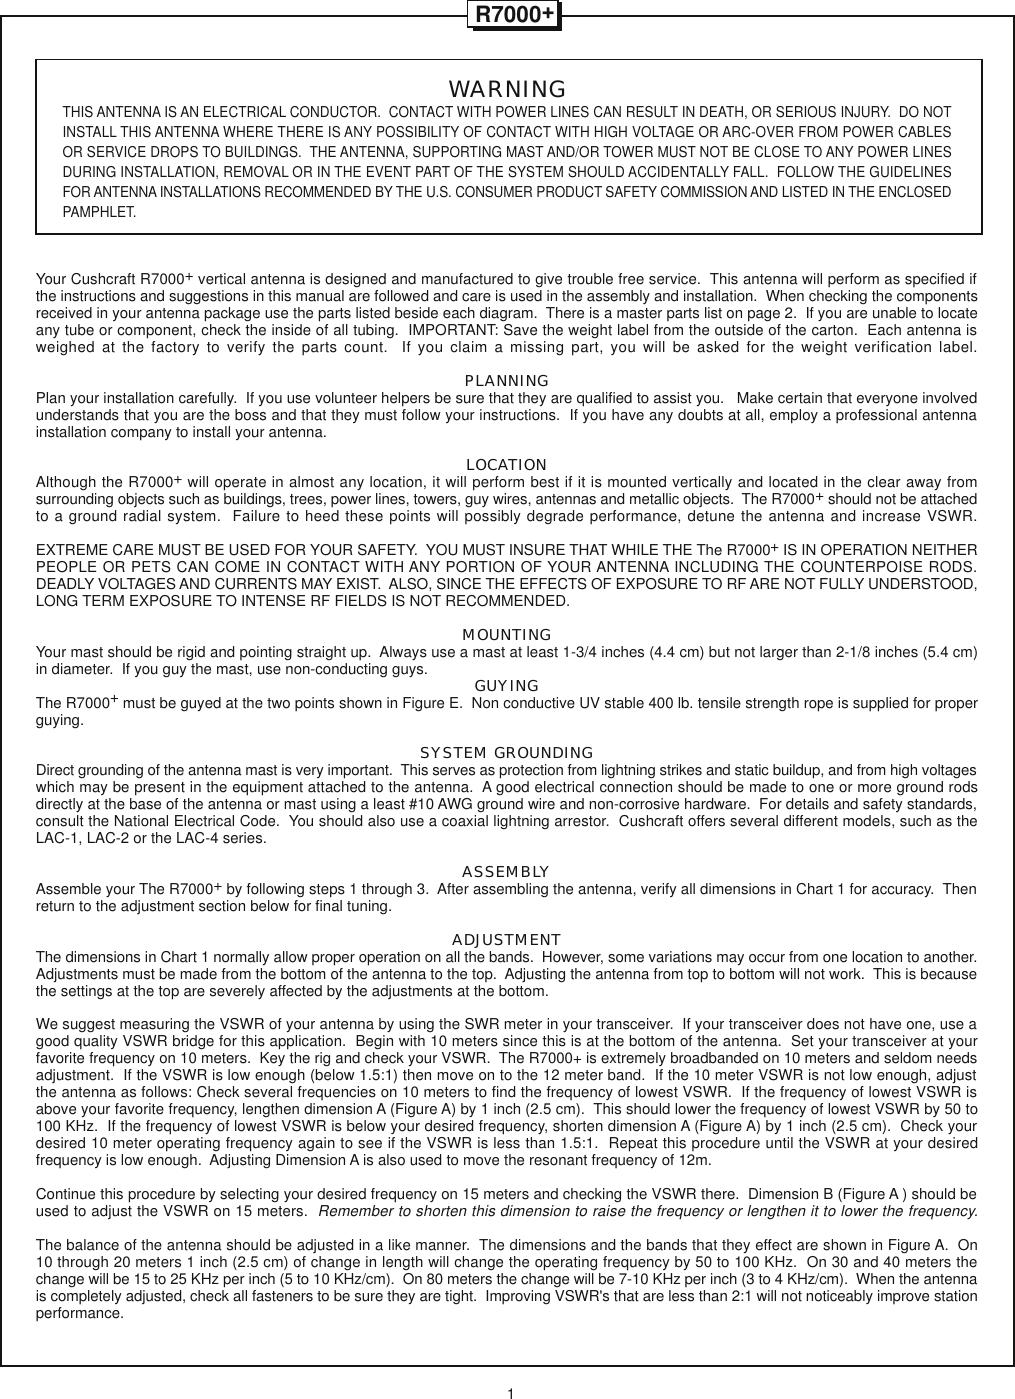 Page 2 of 8 - CUSHCRAFT--R-7000+INSTALLATION CUSHCRAFT--R-7000 INSTALLATION